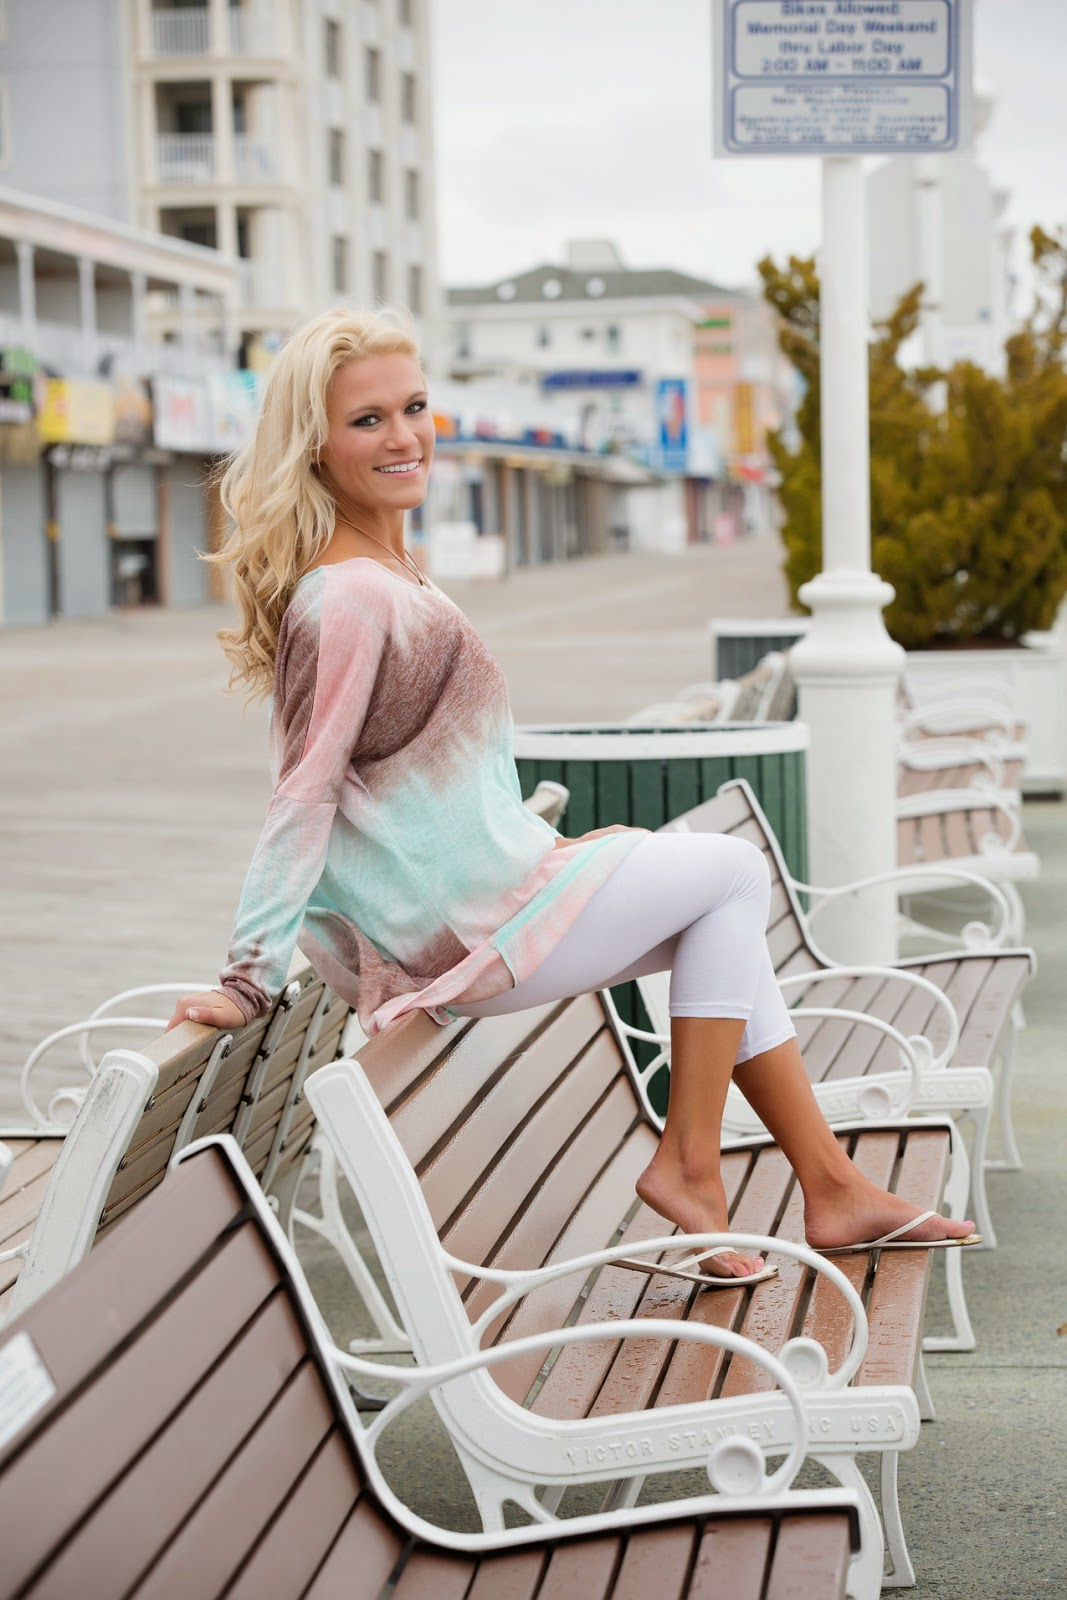 Ocean Photo Shoots Ocean City Boardwalk Shoot